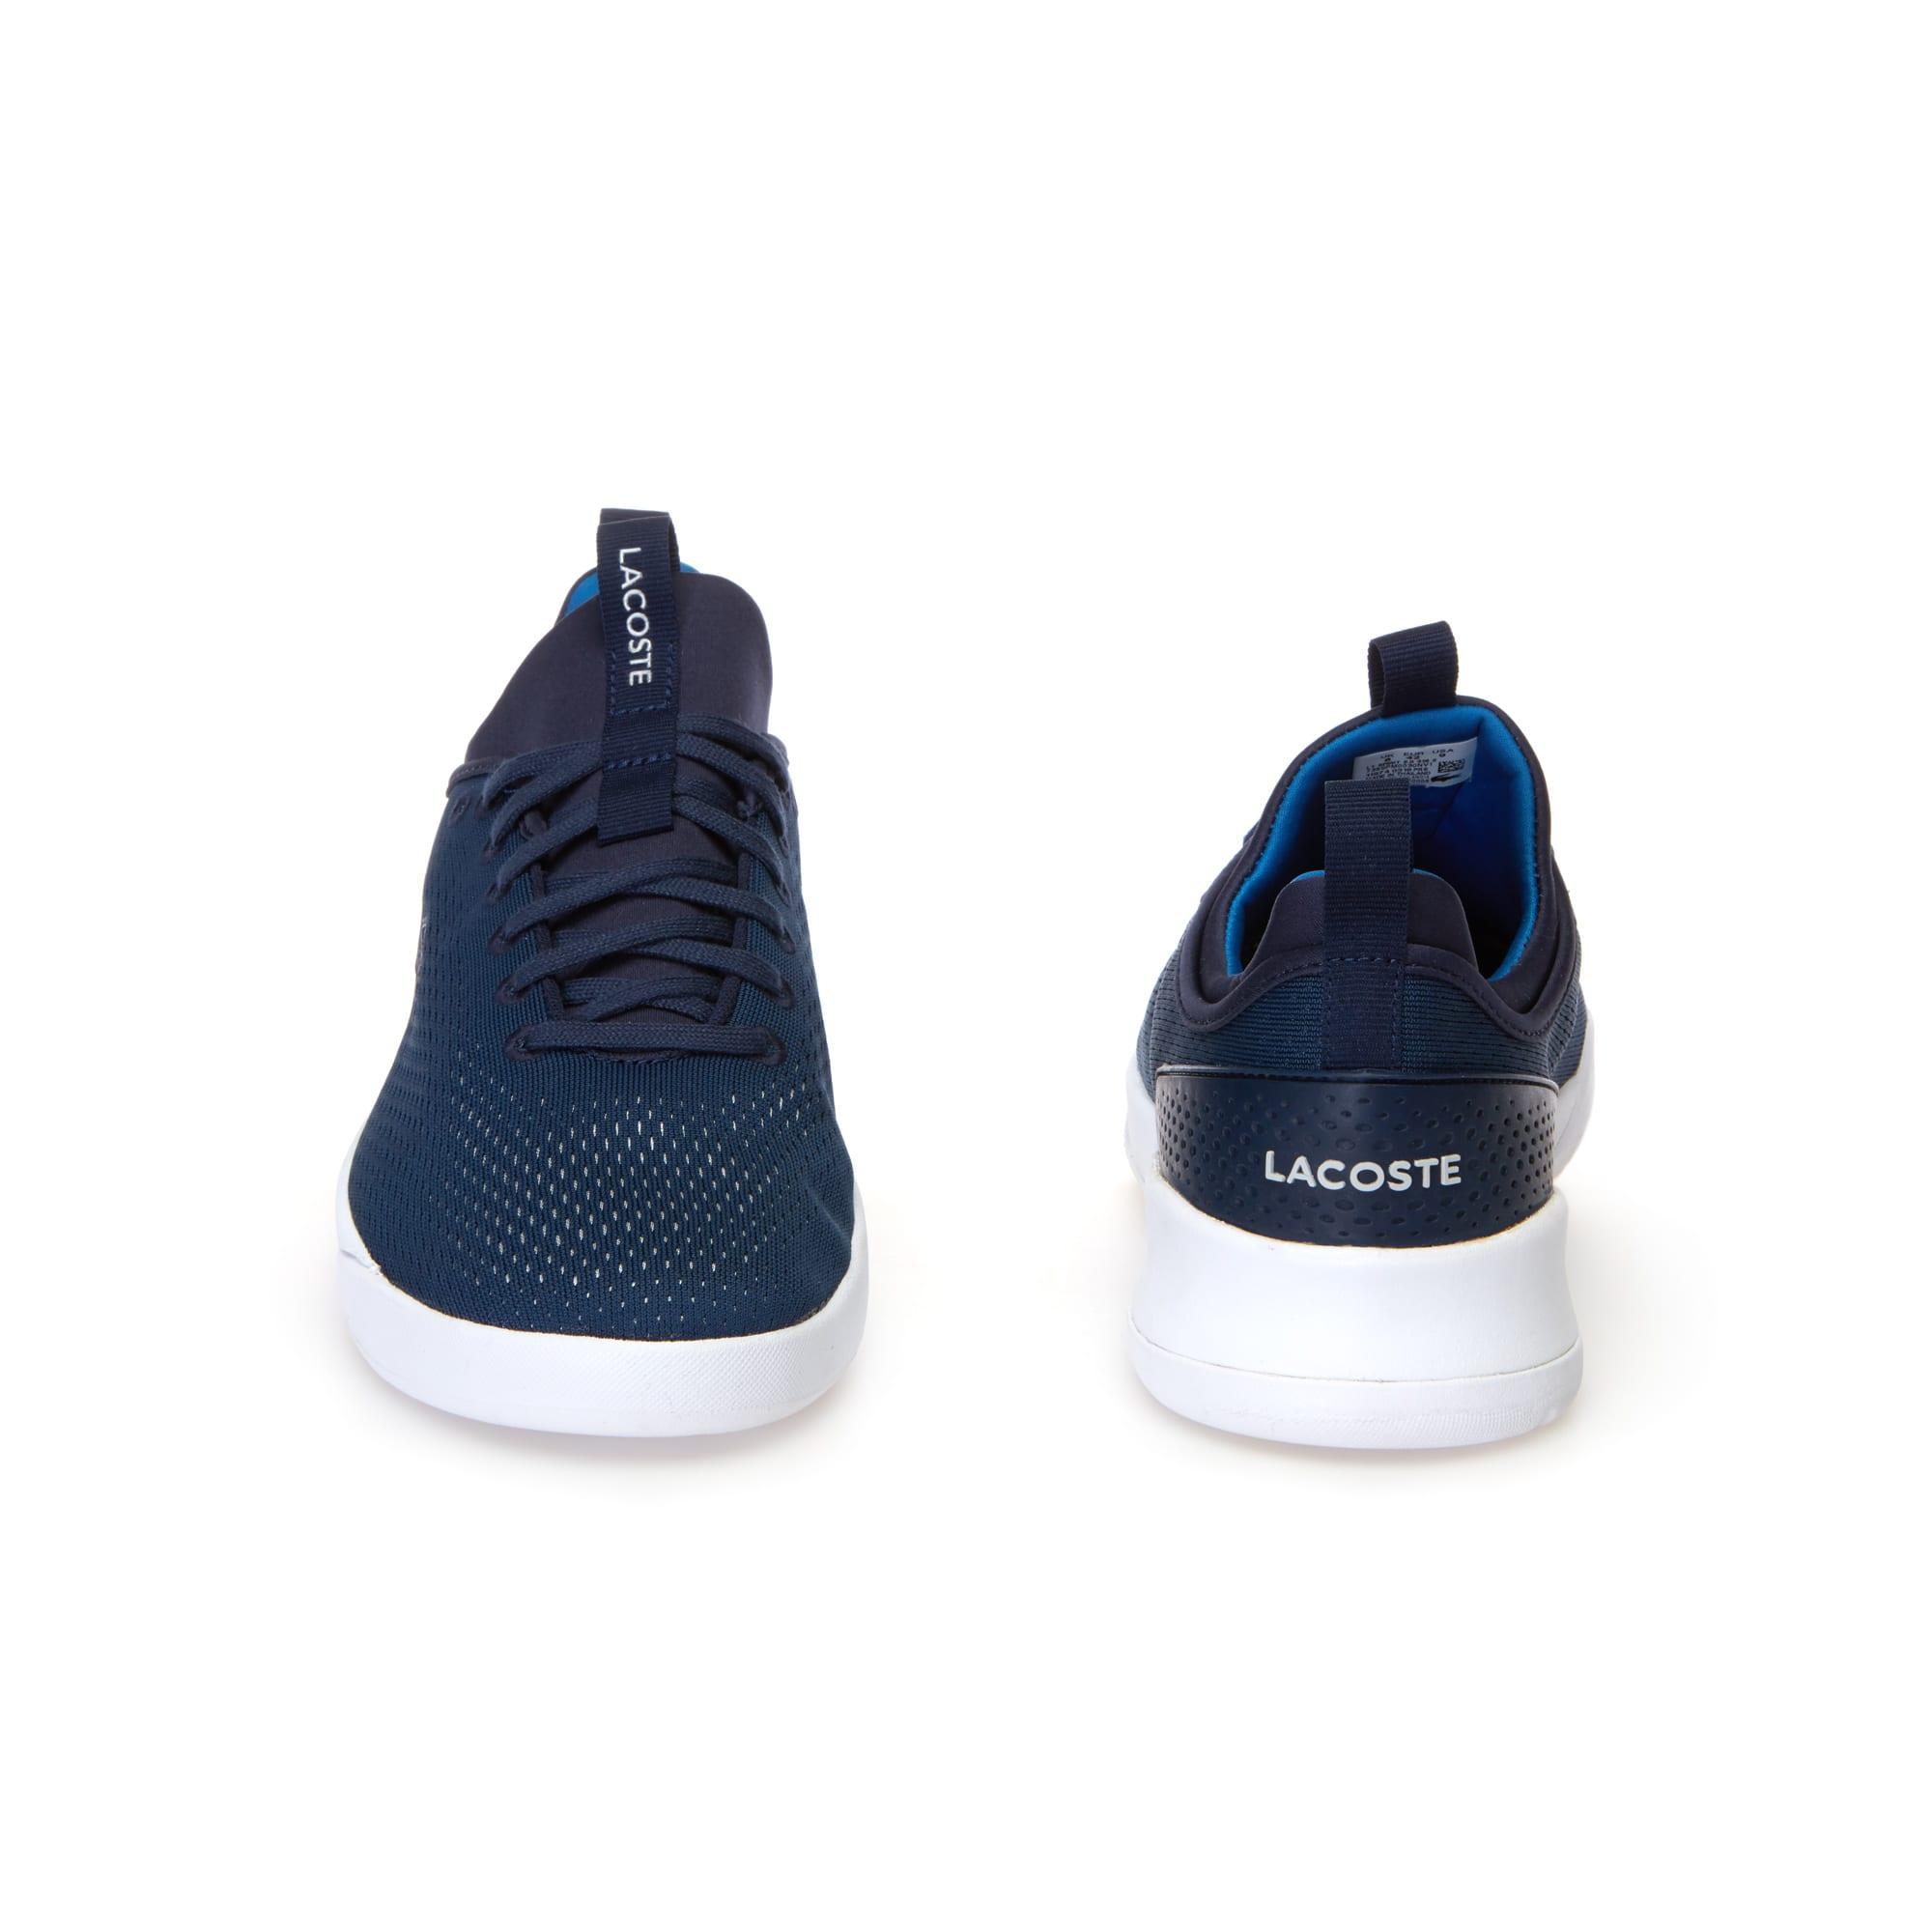 Lacoste - Zapatillas de hombre LT Spirit SPORT 2.0 de malla - 5